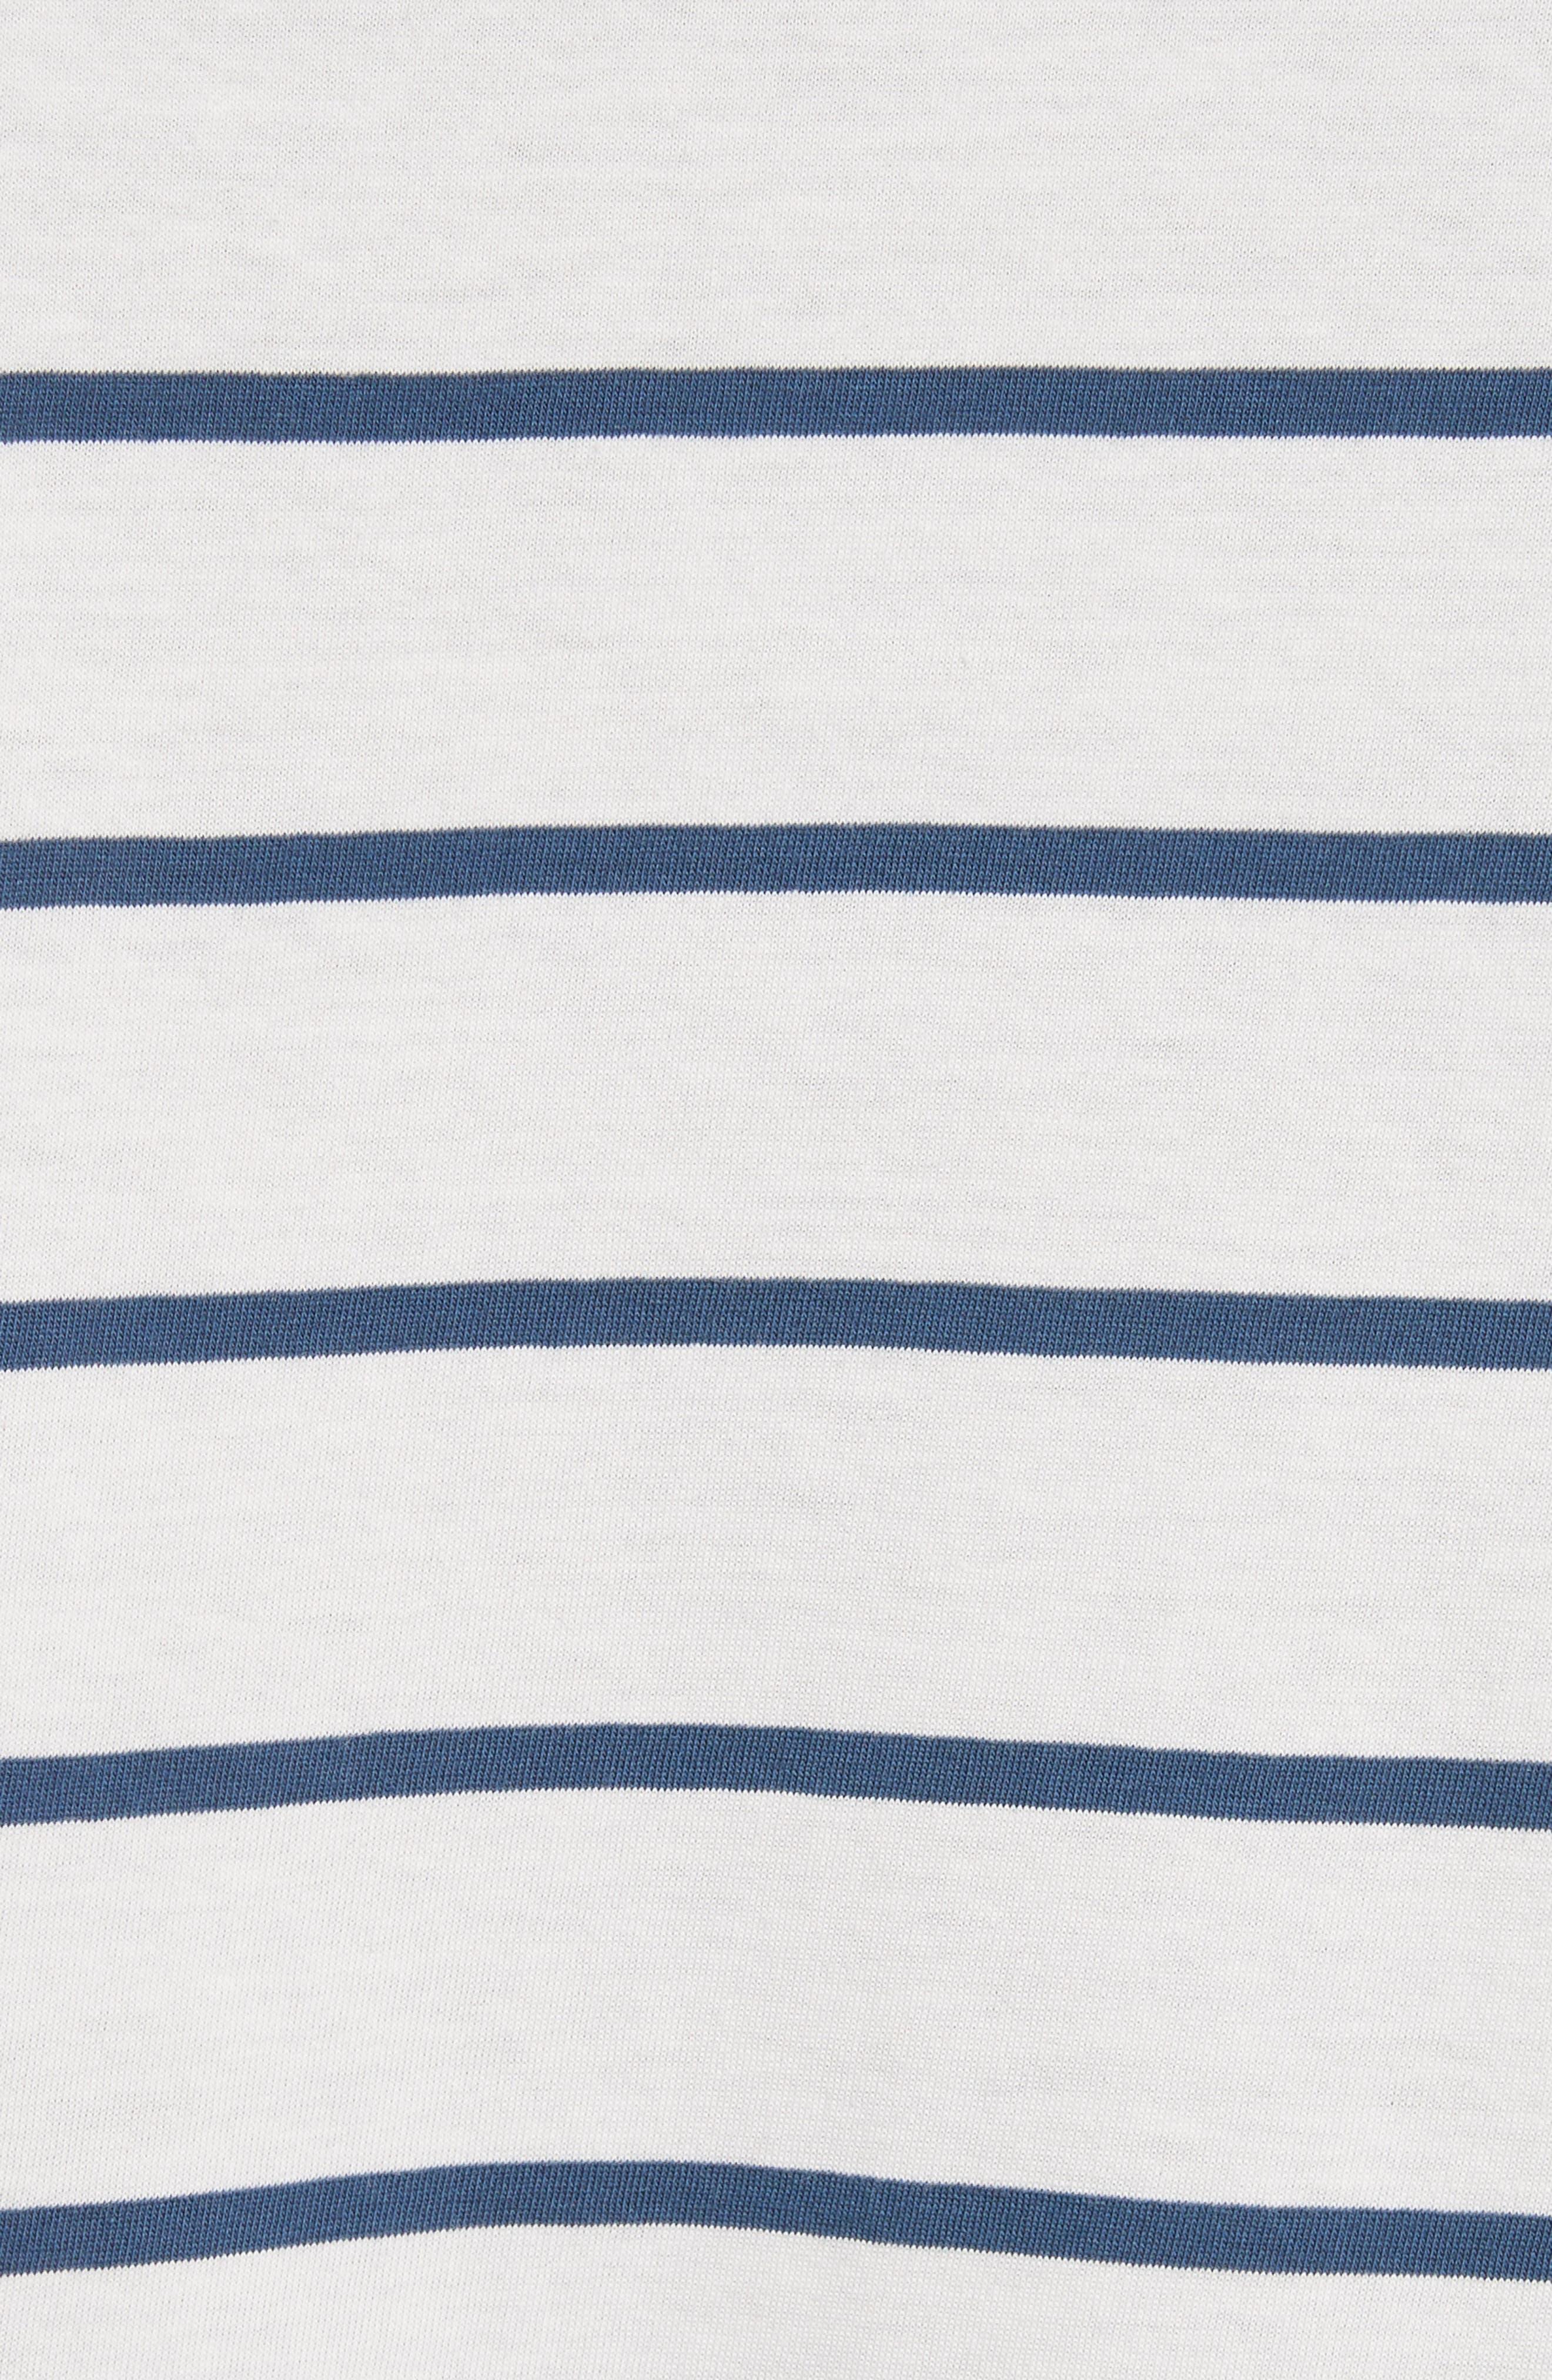 Mixed Stripe Pocket T-Shirt,                             Alternate thumbnail 5, color,                             435